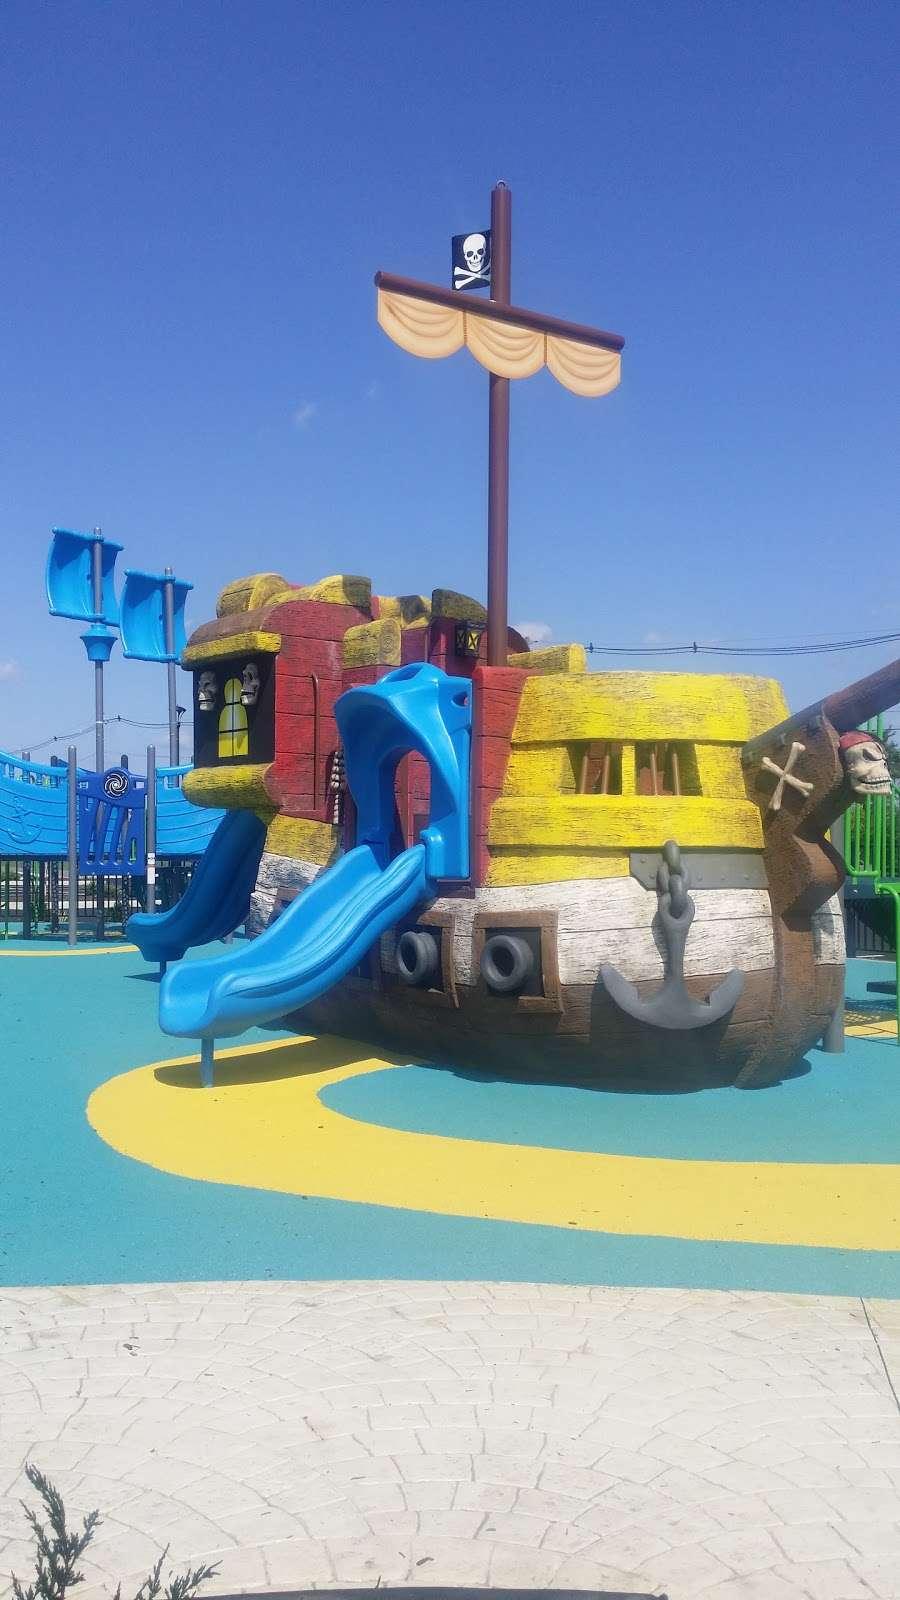 Pirate's Cove - park  | Photo 6 of 10 | Address: 449 Raritan Blvd, Keyport, NJ 07735, USA | Phone: (908) 587-4137